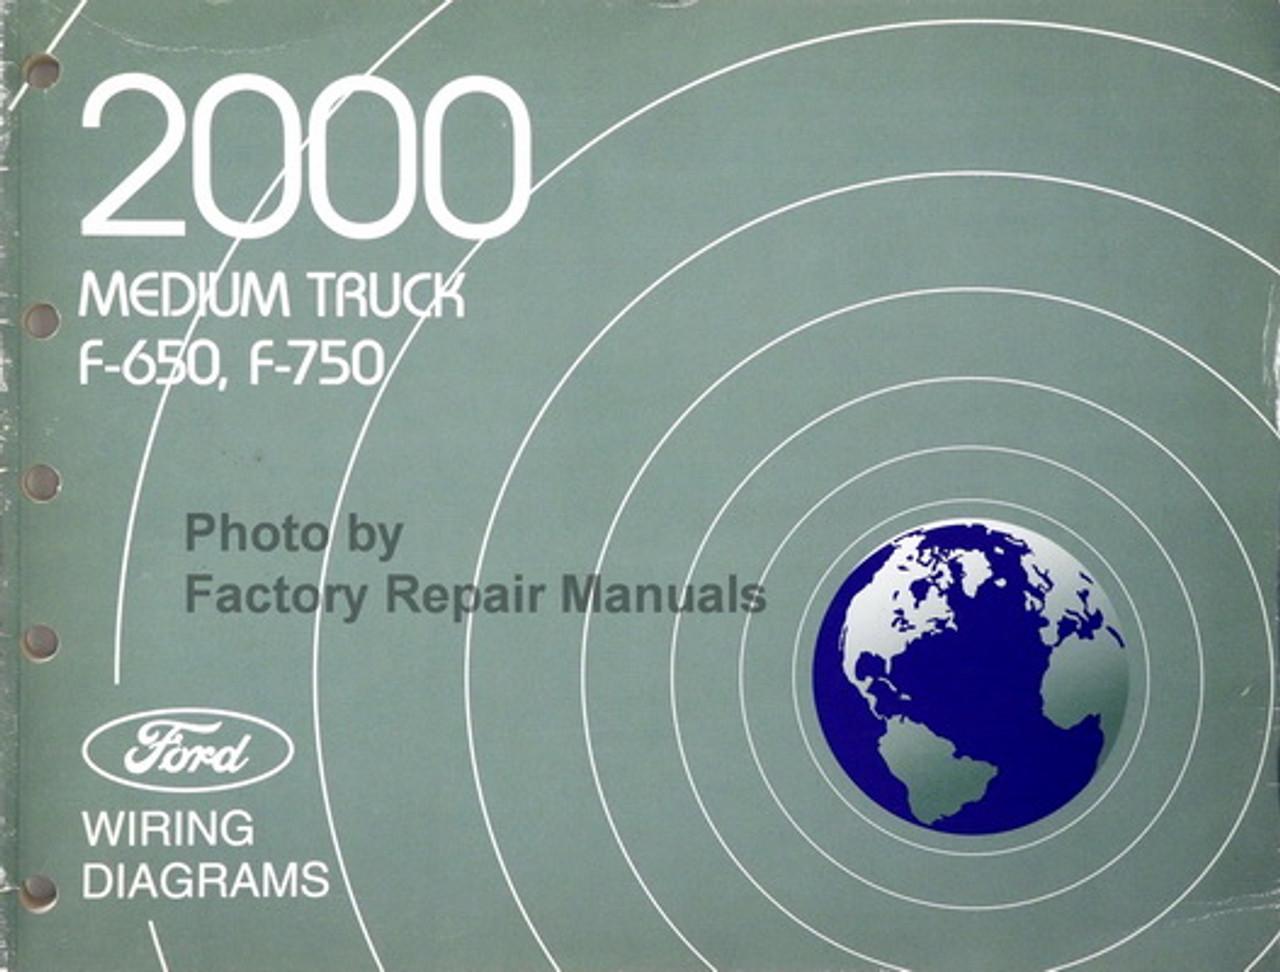 Diagram Dash Wiring Diagram 2000 F750 Full Version Hd Quality 2000 F750 Hardwiringpa2g Atuttasosta It